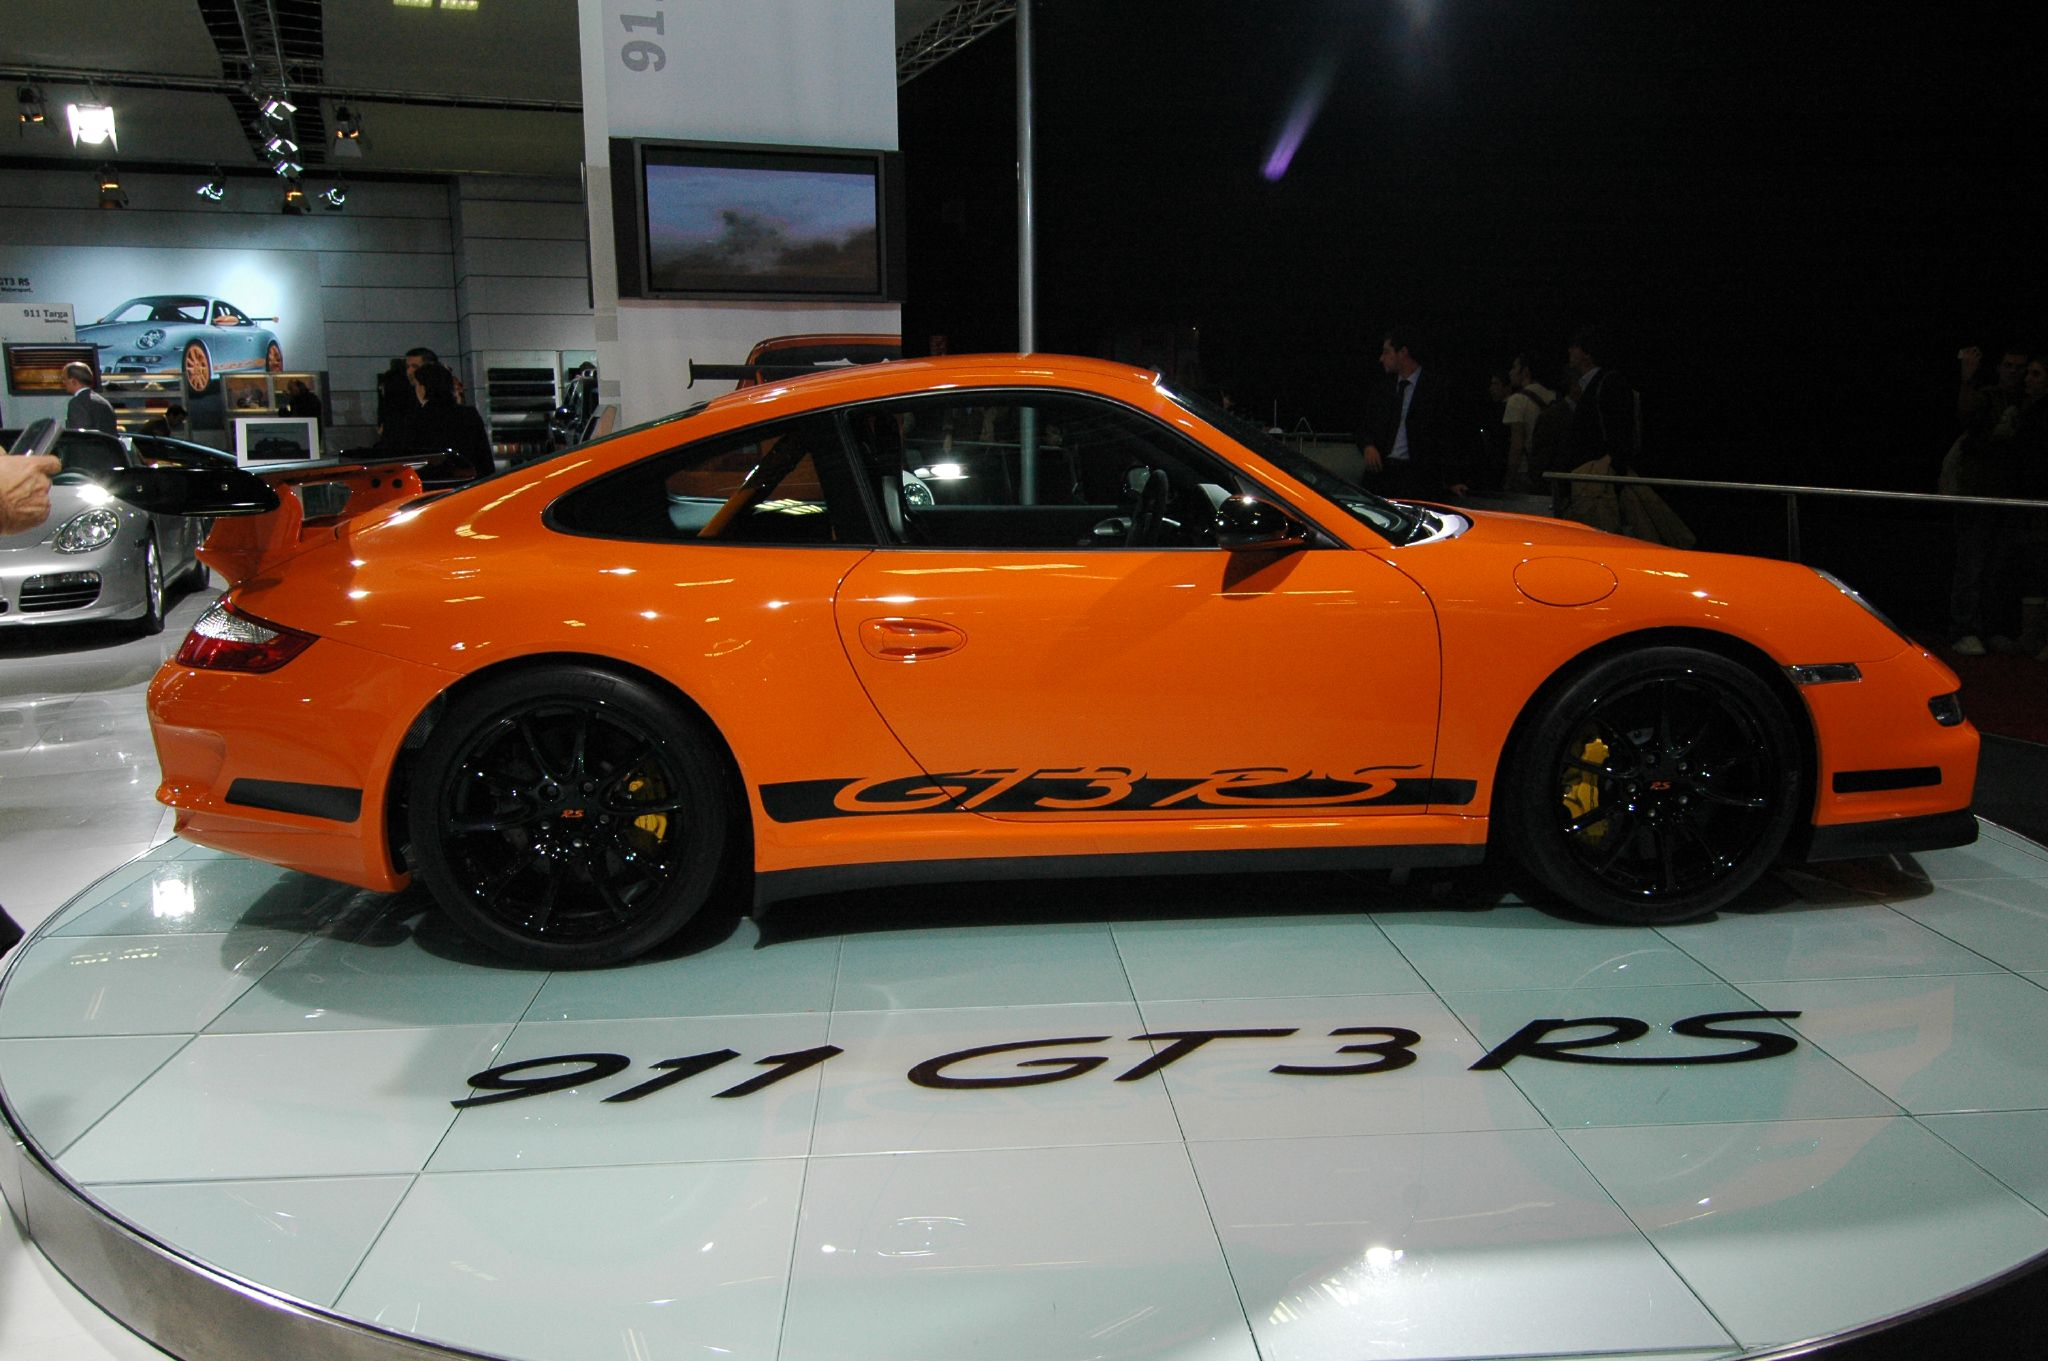 FileOrange Porsche 911 GT3 RS Type 997 (side)